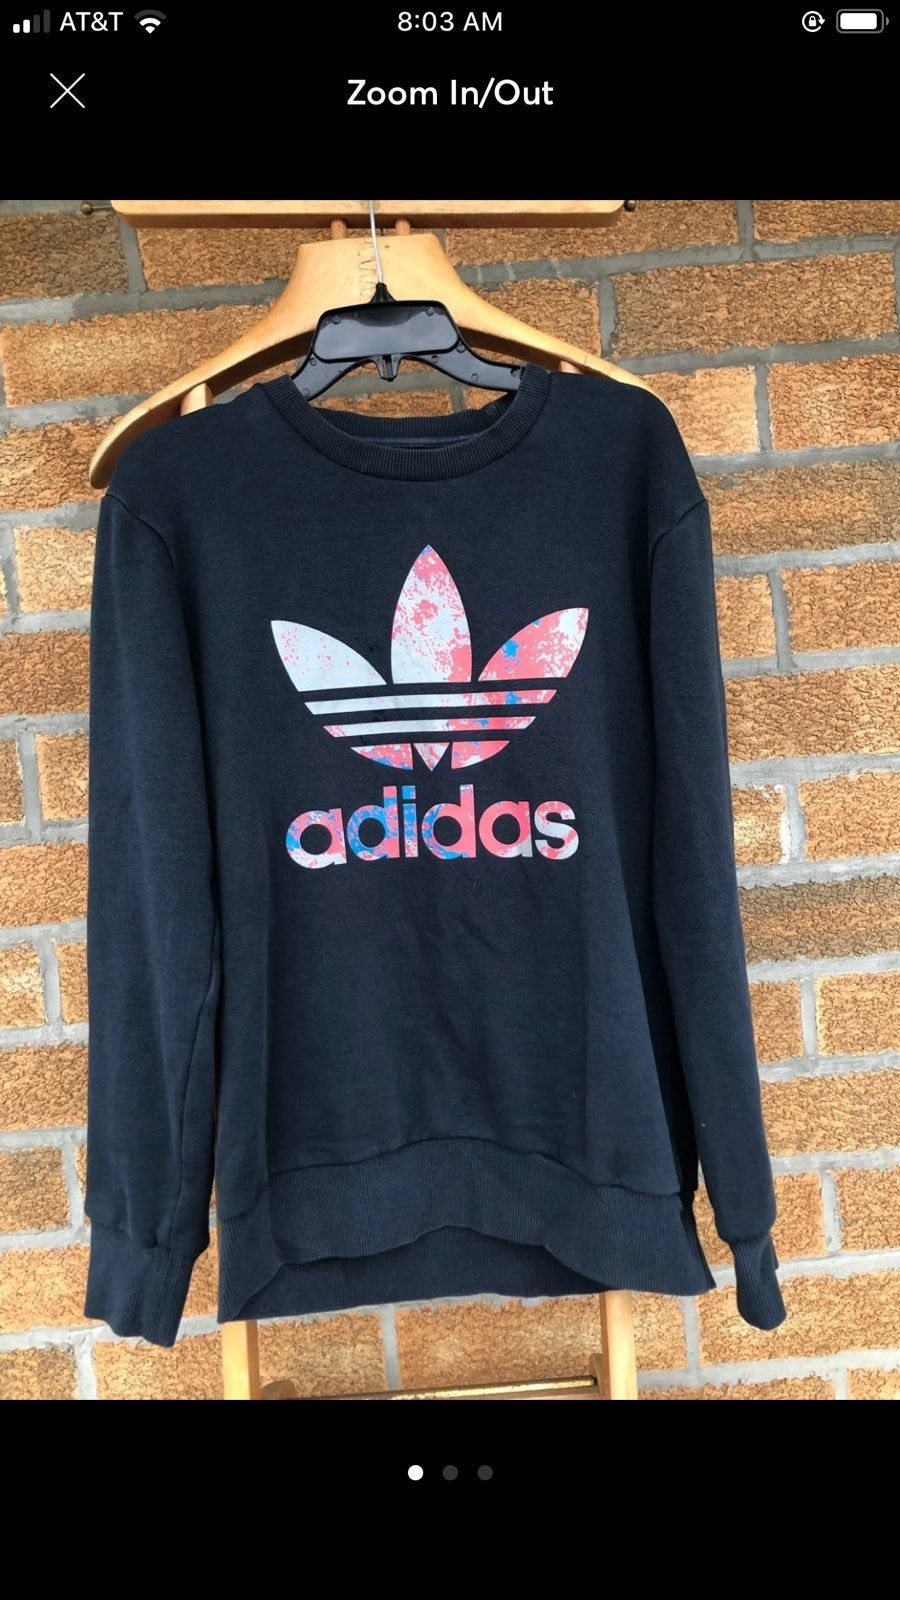 Adidas Originals Sweatshirt Size Small Sweatshirts Adidas Crop Adidas Hoodie [ 1600 x 900 Pixel ]